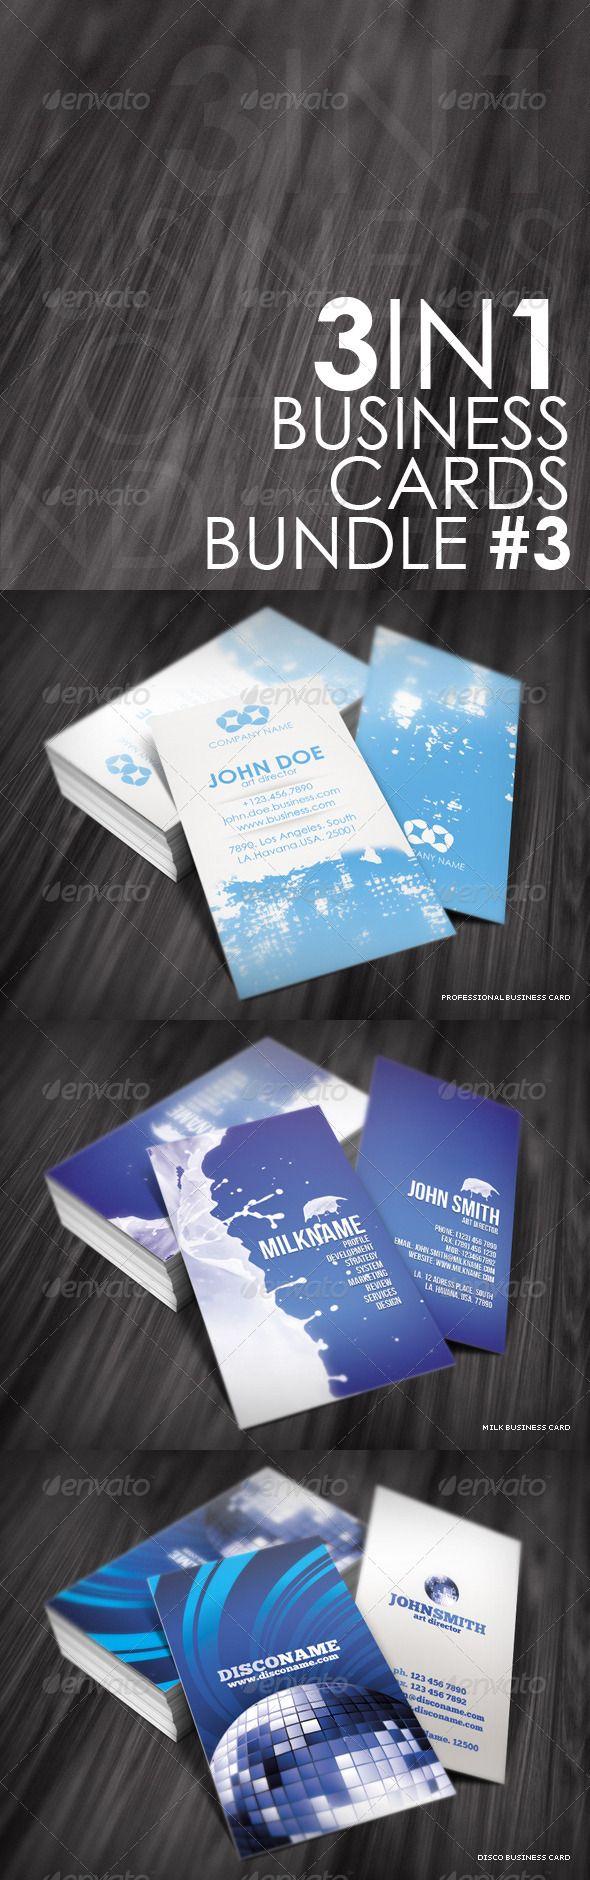 Disco Ball Gold Business Card Zazzle Com In 2020 Gold Business Card Disco Ball Dj Business Cards